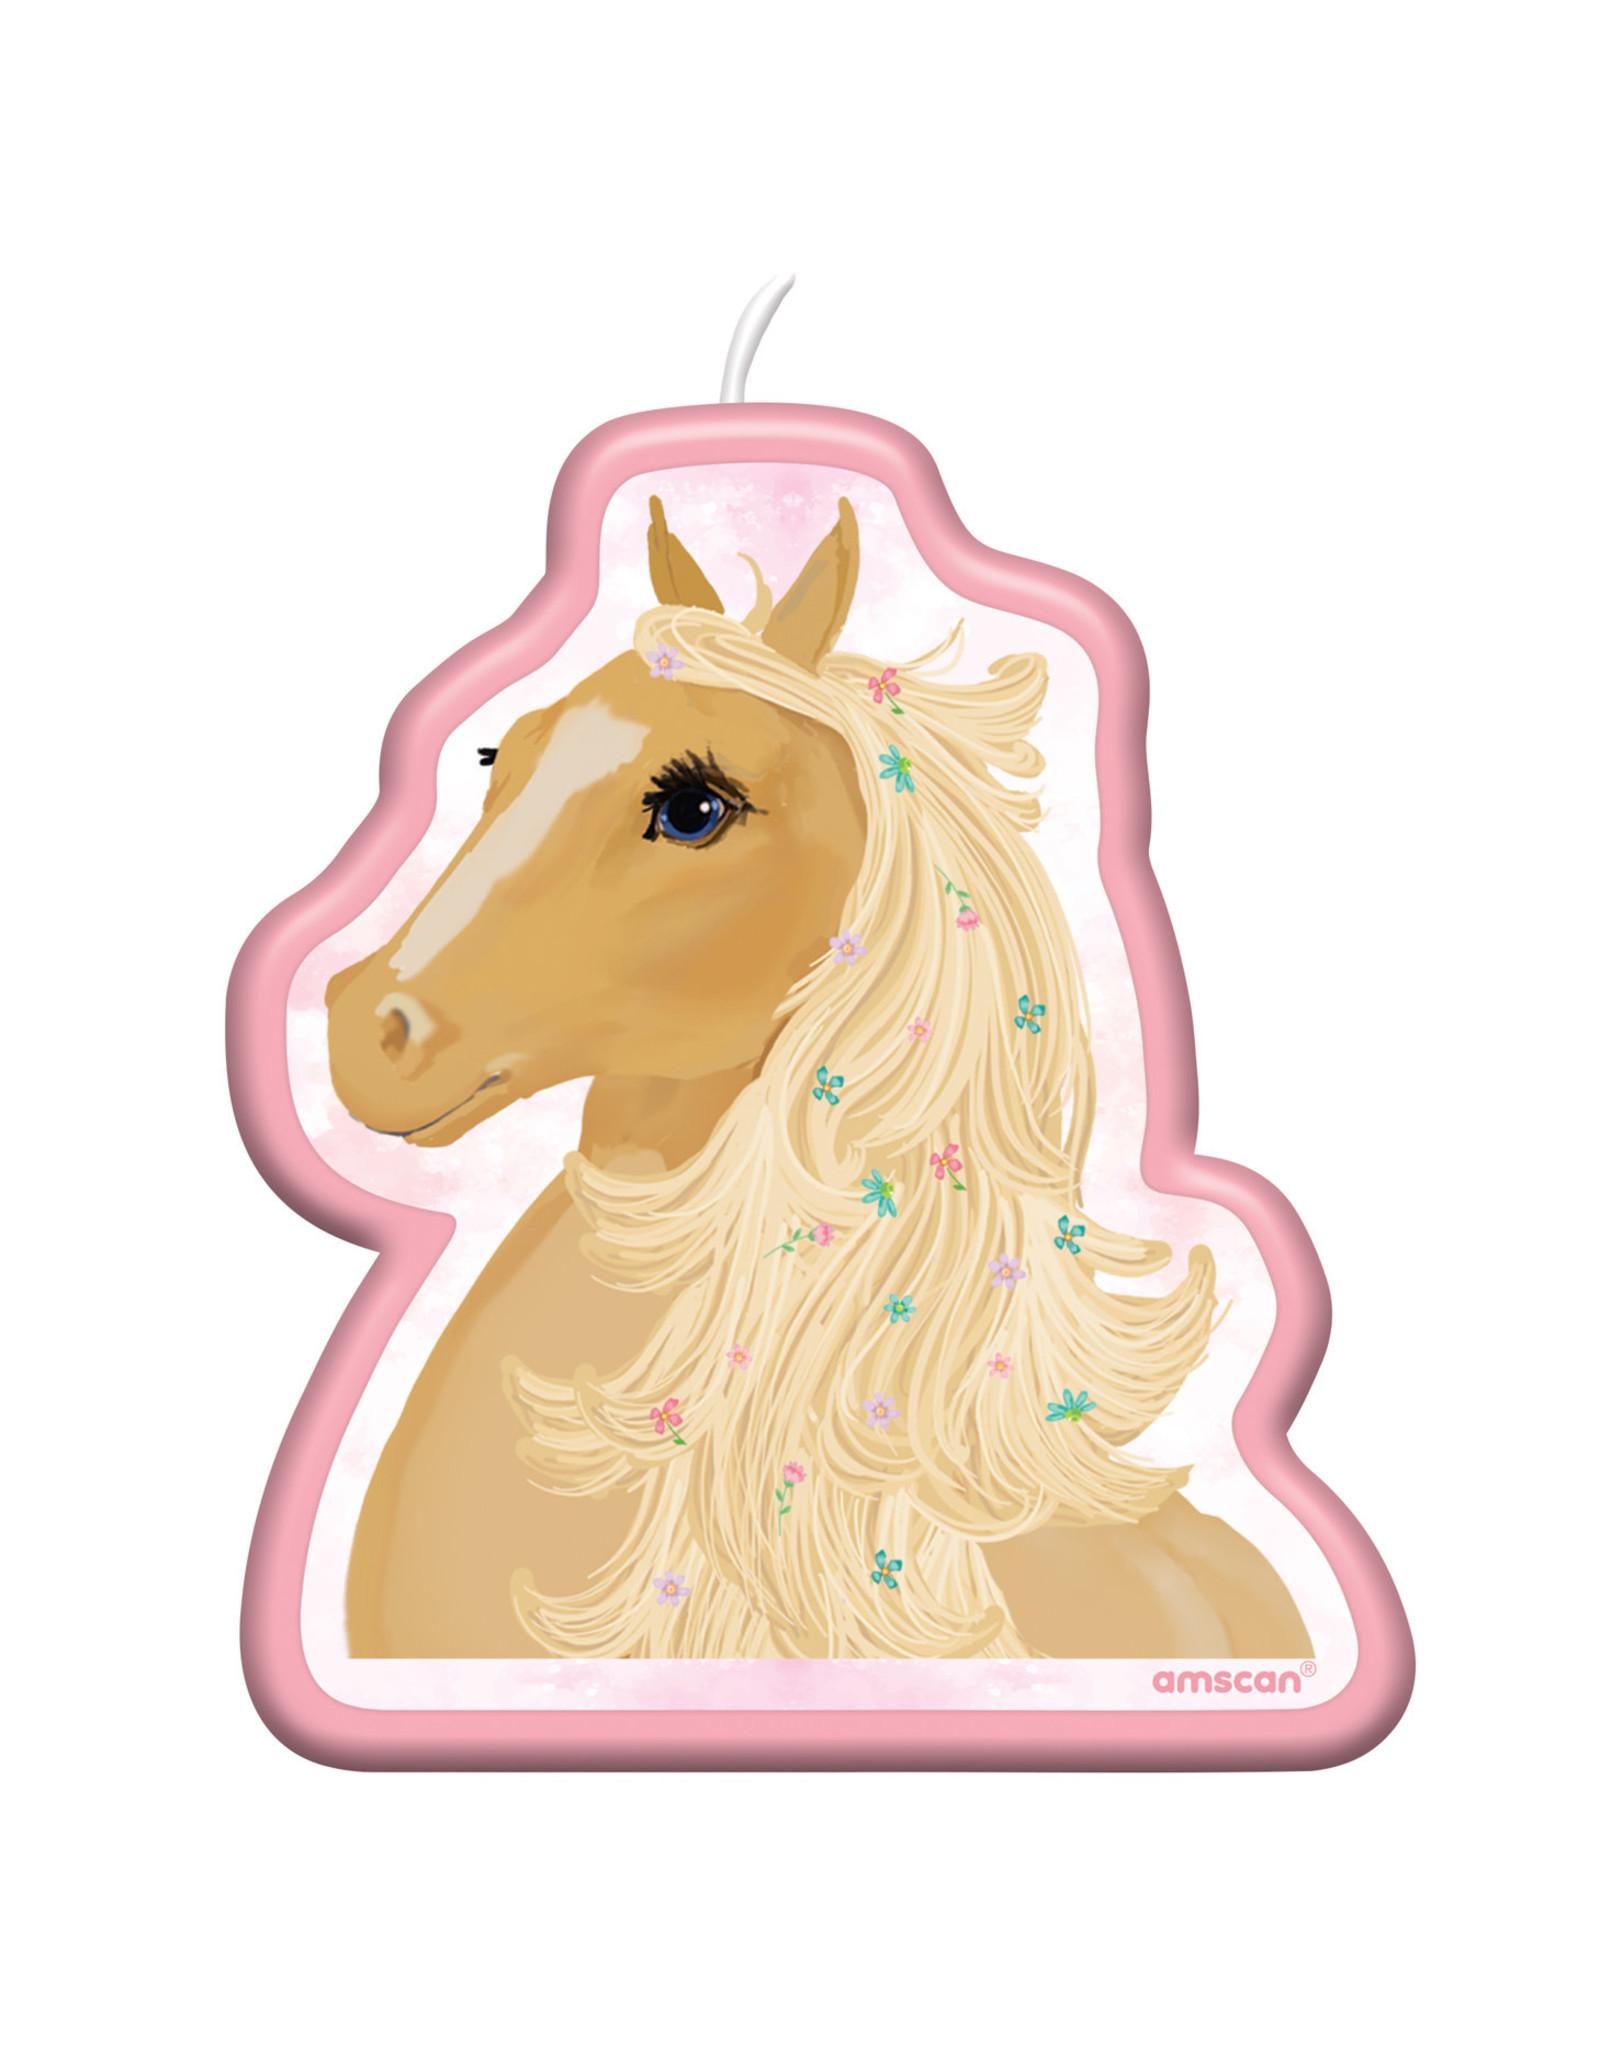 Amscan beautiful horses kaars 1 stuk